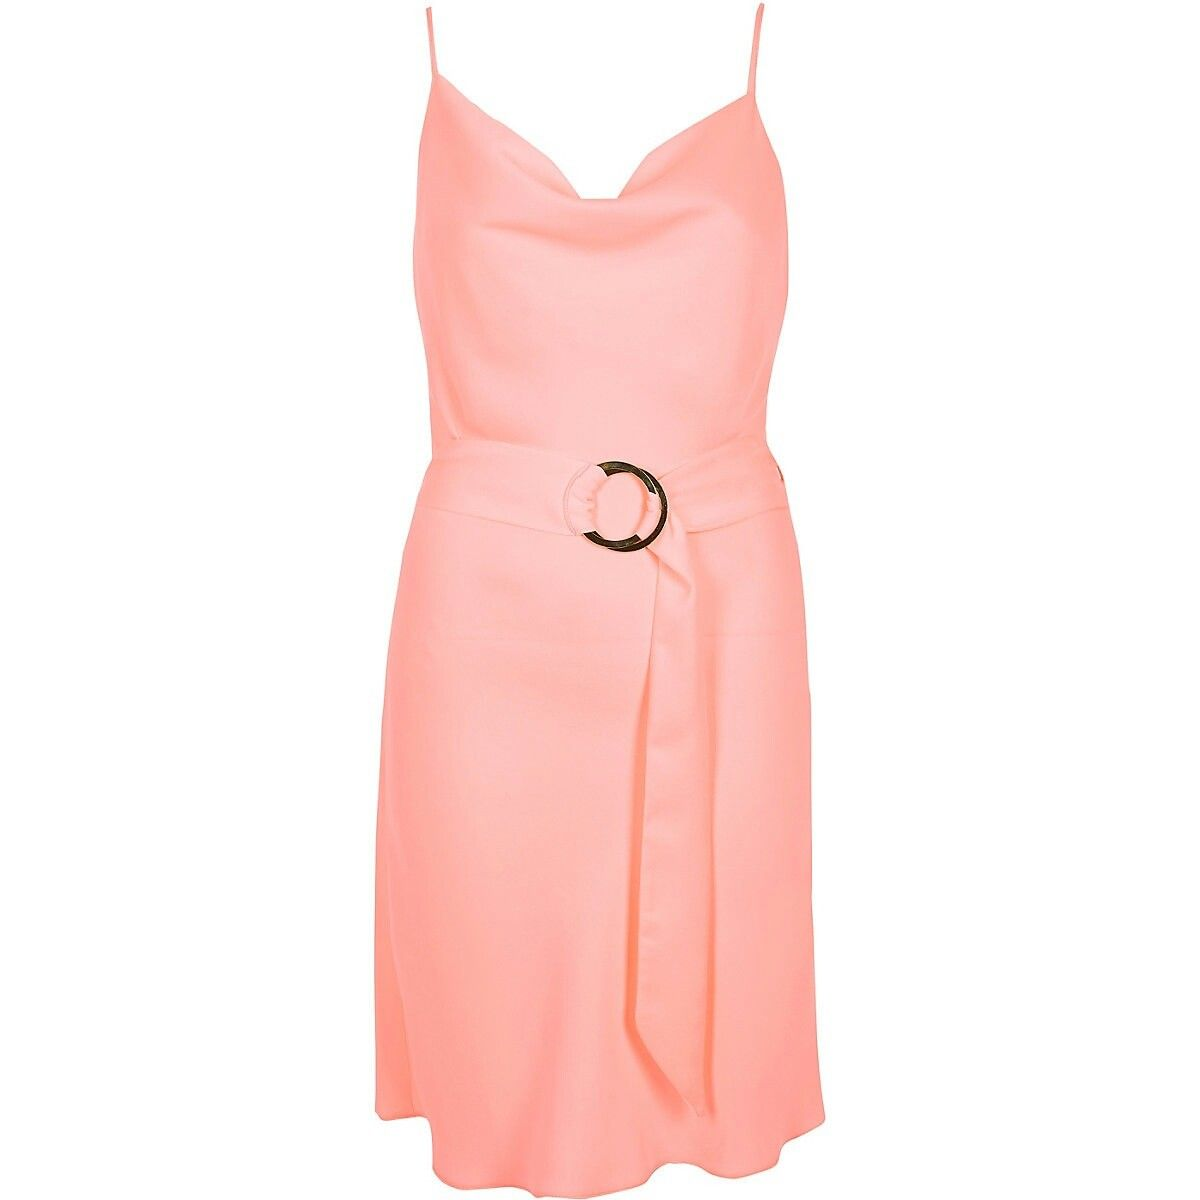 c934c726adb69 Bright pink cowl neck belted slip dress | Short Dresses x2 in 2019 ...